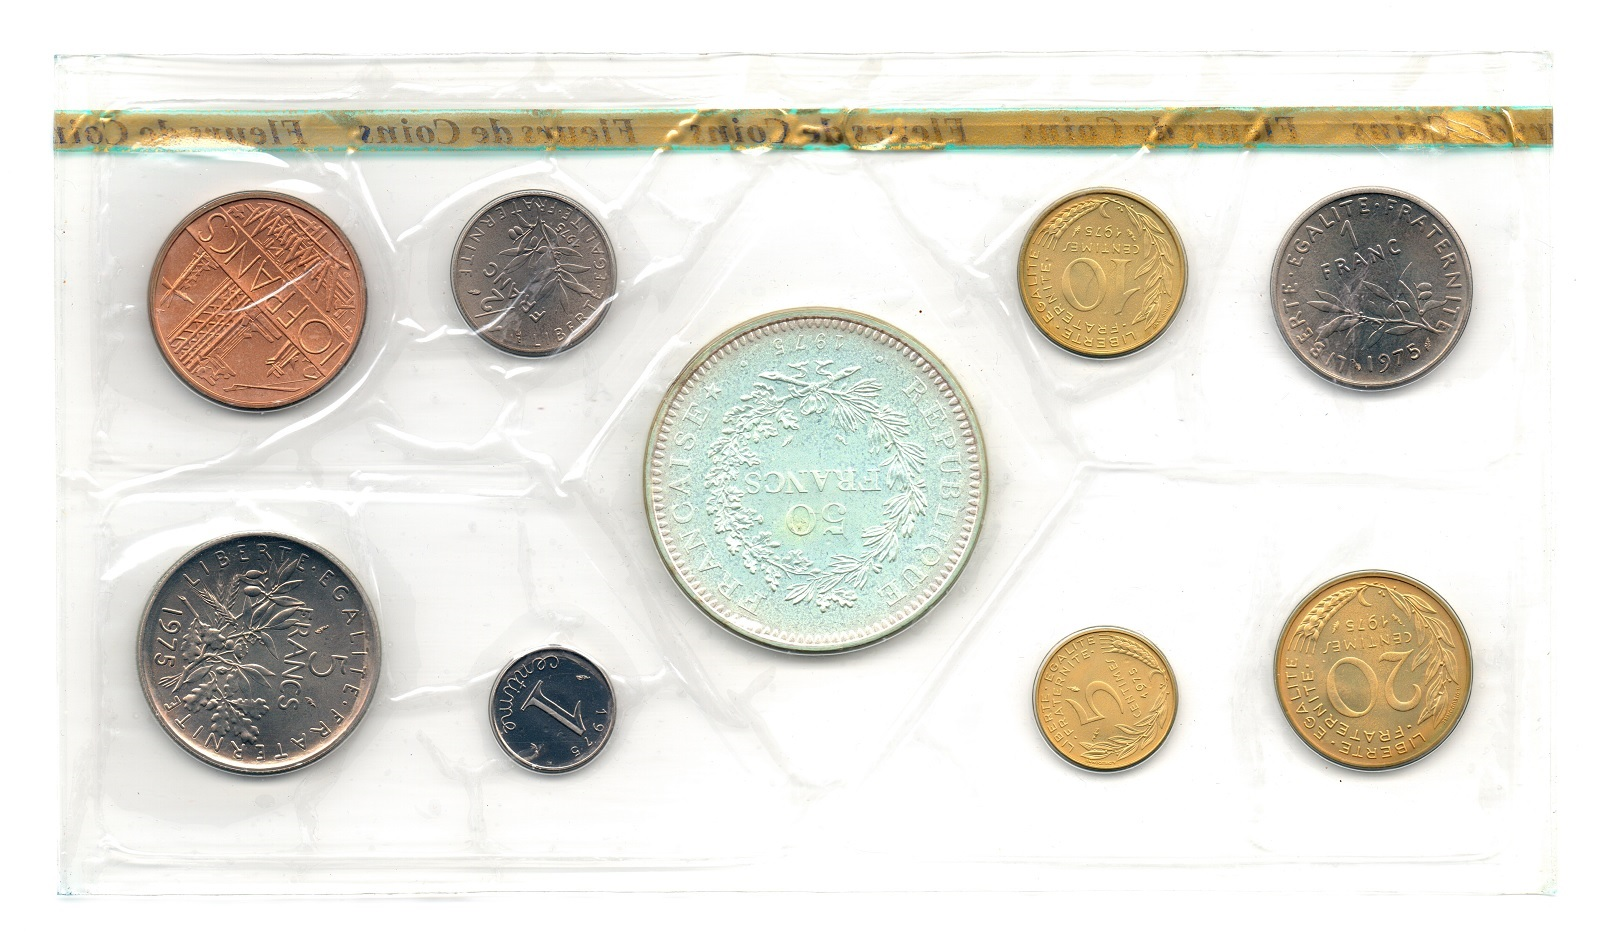 (FMO.CofBU_.1975.Cof-FDC.000000001) FDC coin set France 1975 Reverses (zoom)